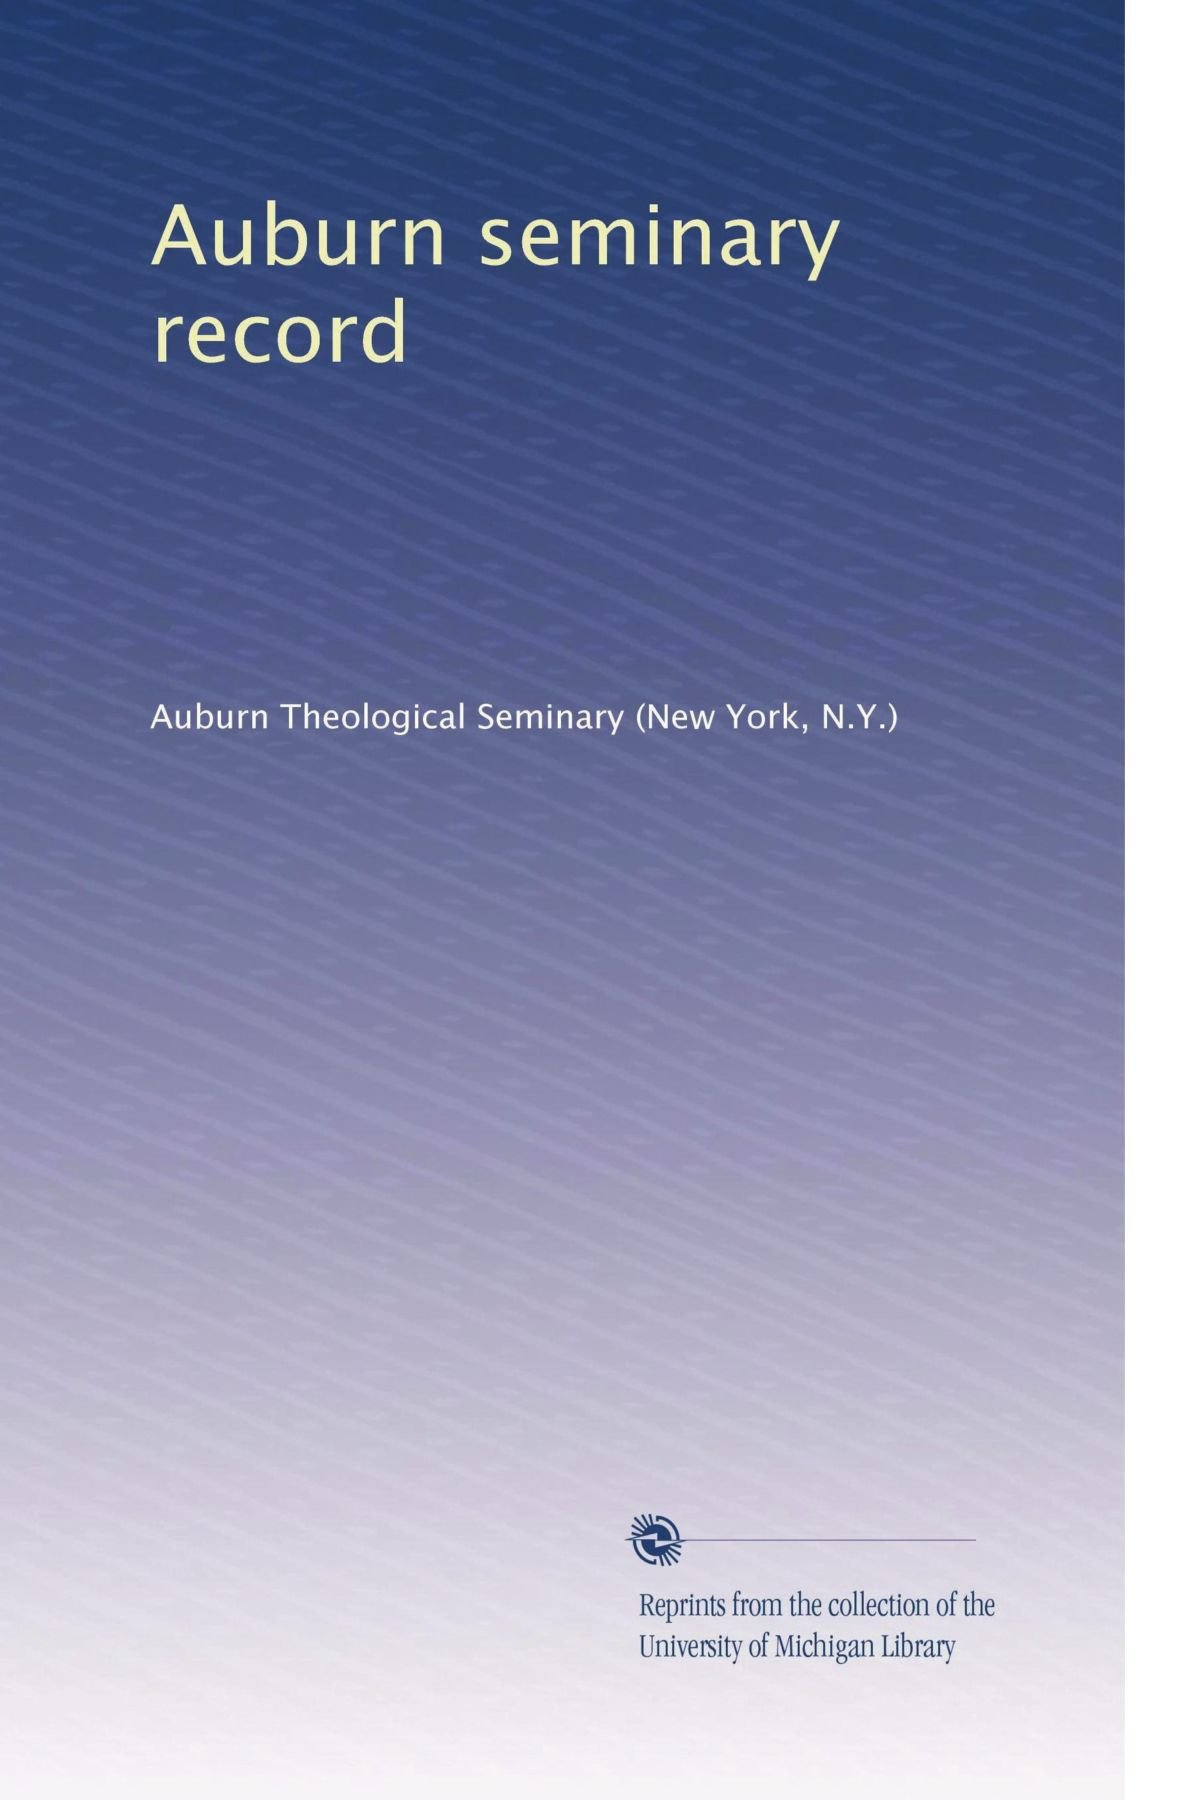 Download Auburn seminary record (Volume 24) PDF